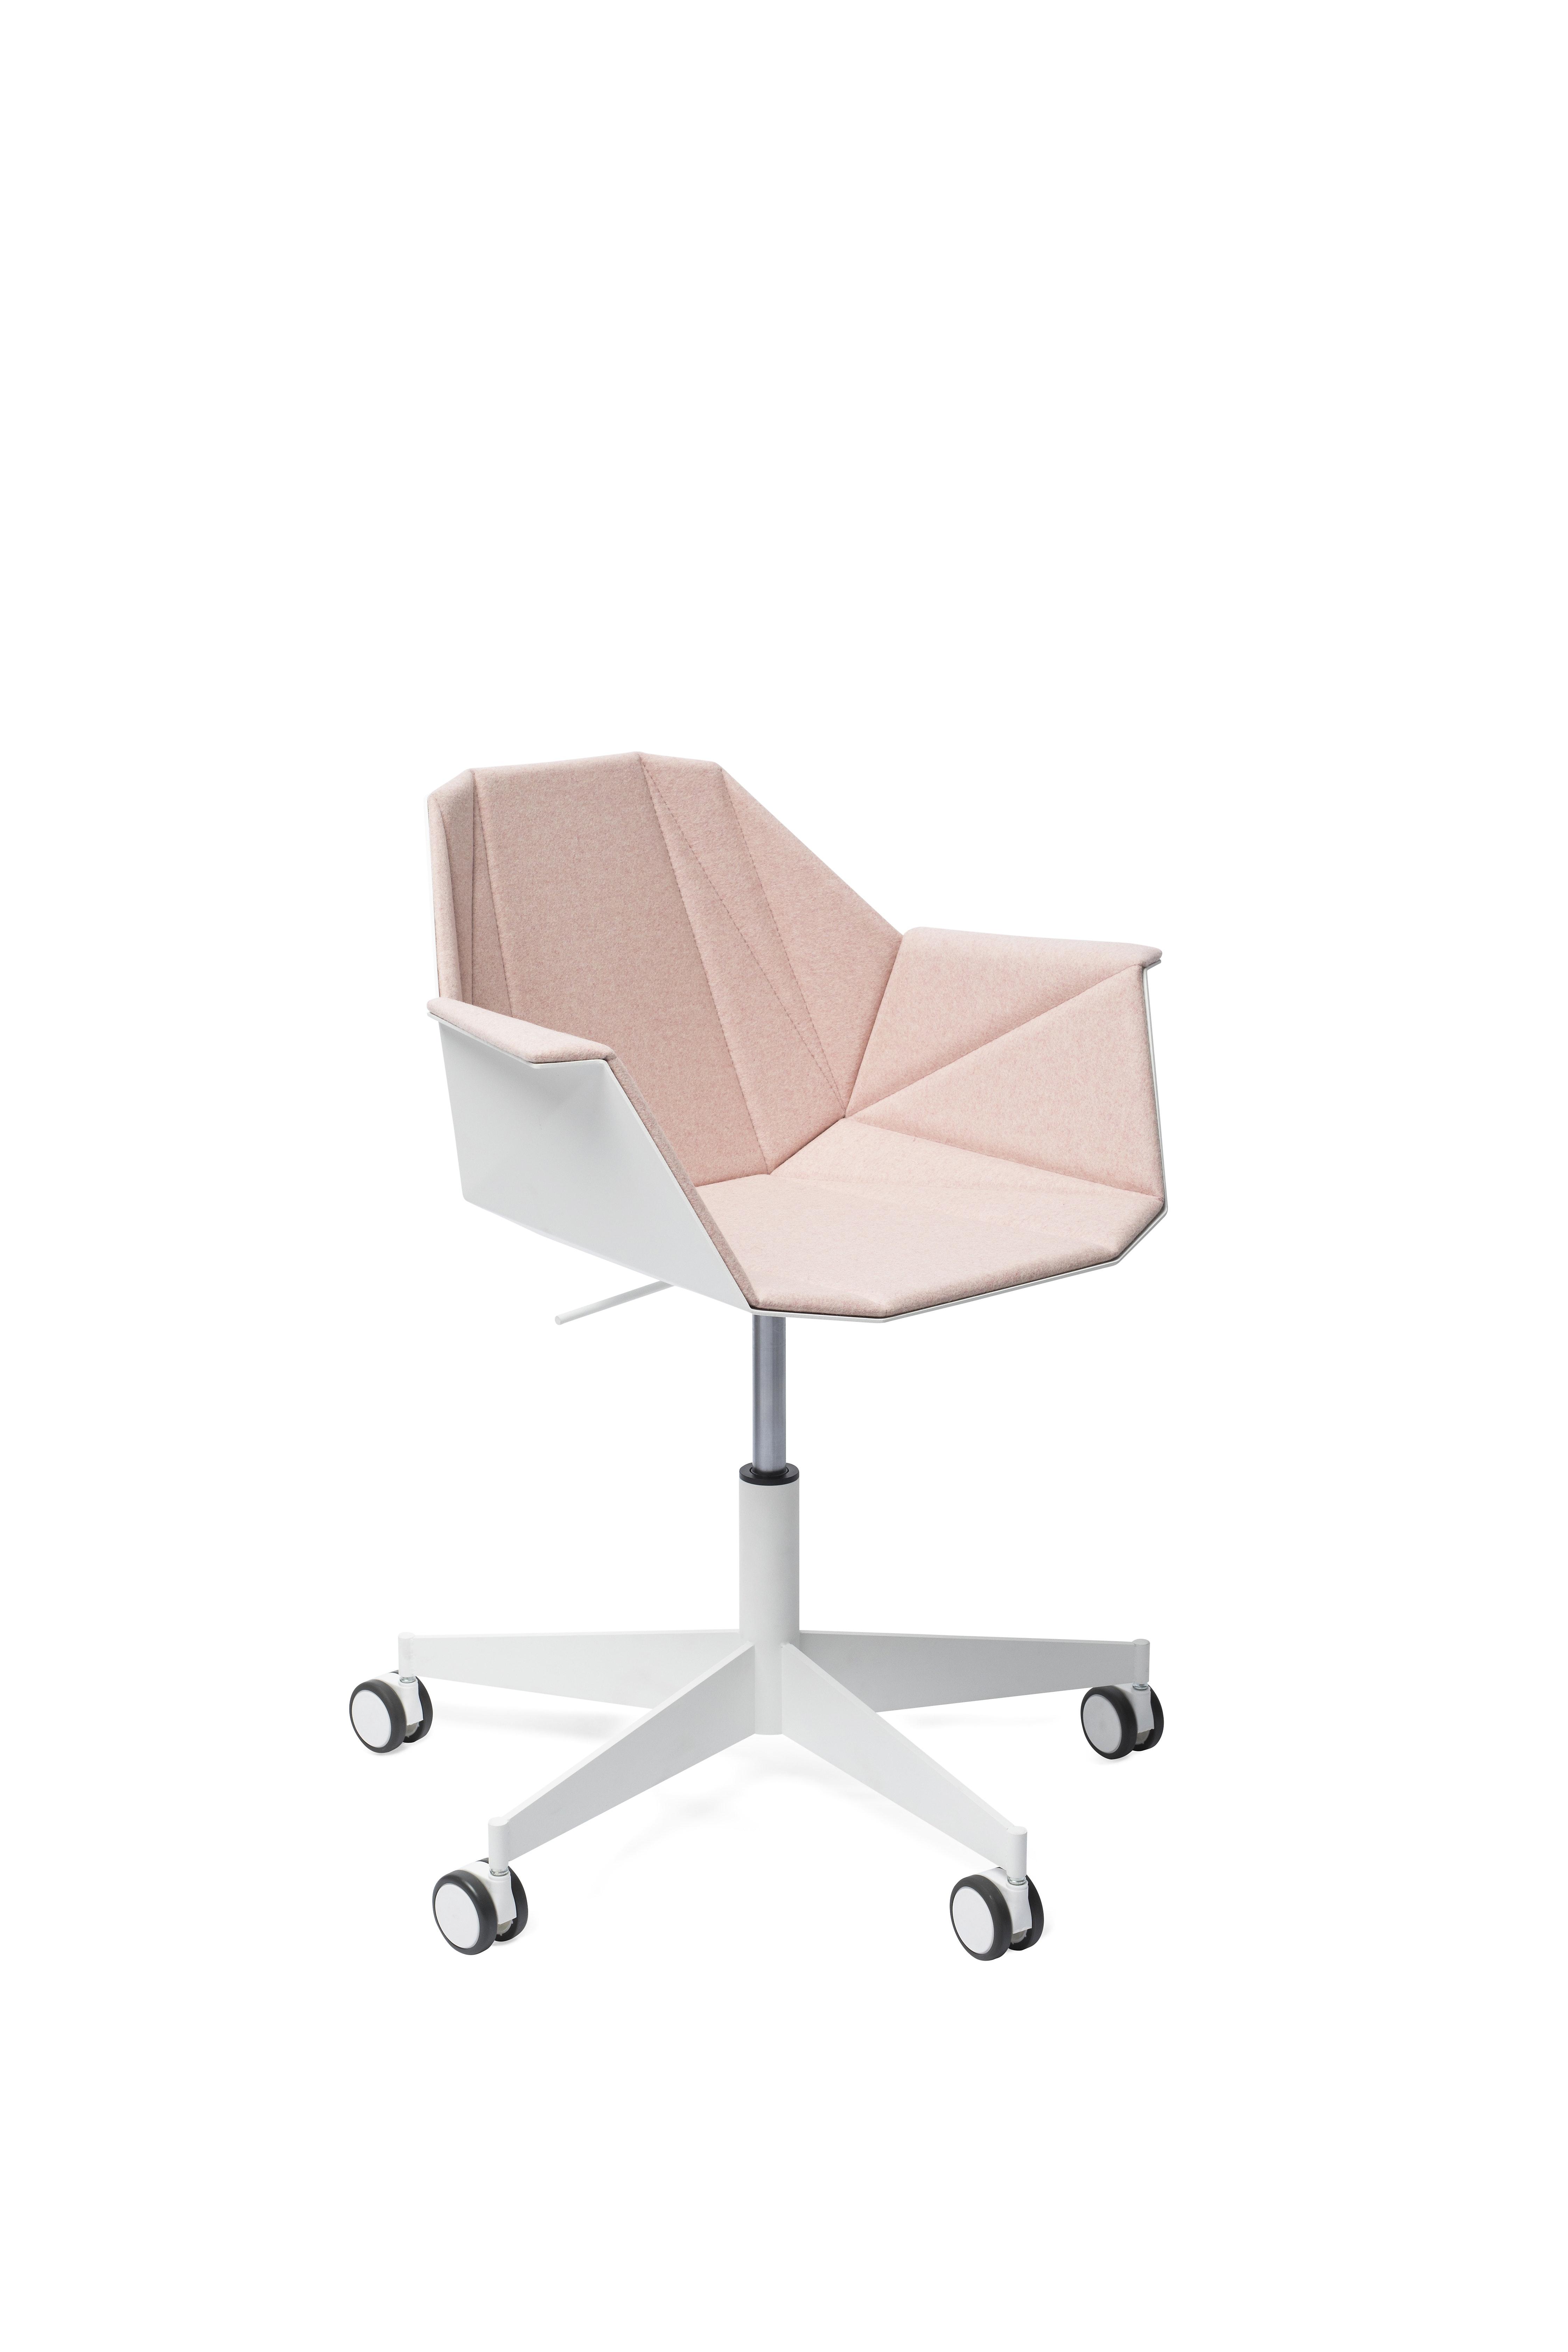 Alumni Task White Pink Upholstered Side Angle